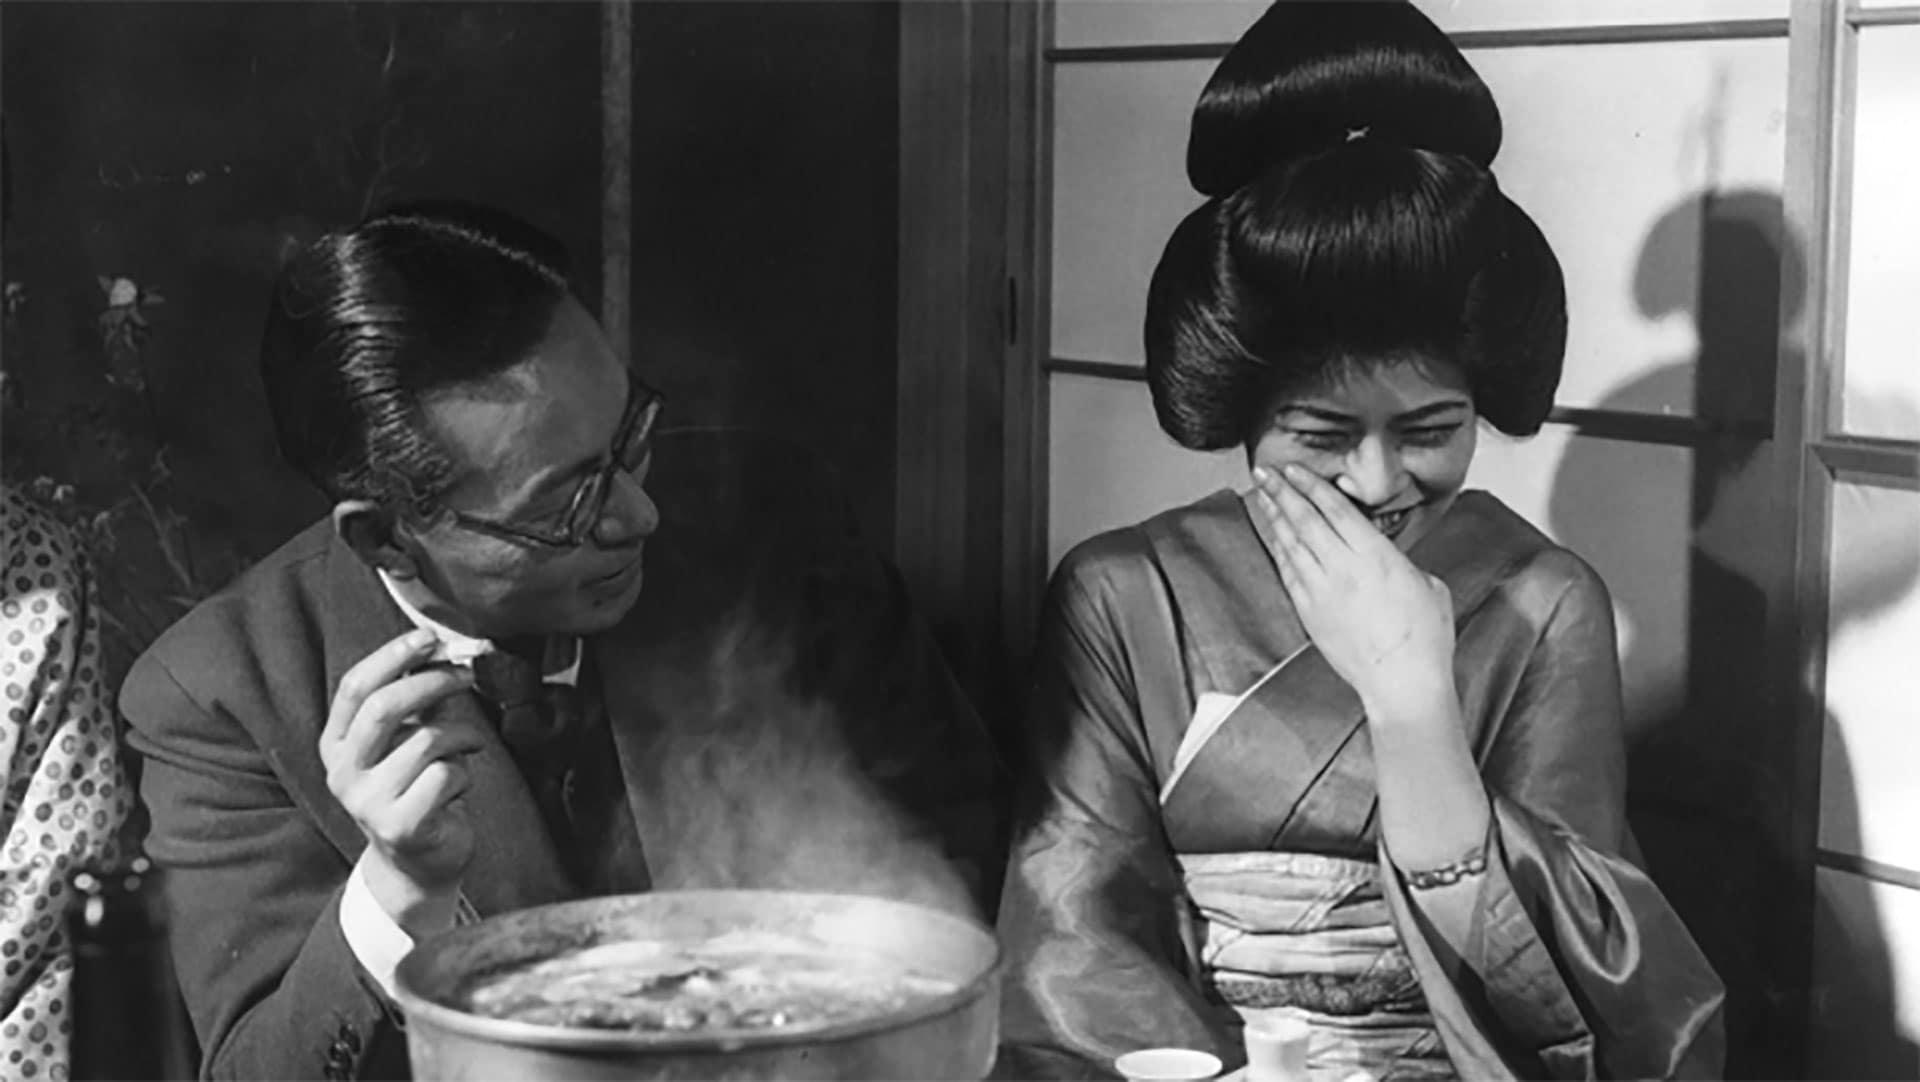 Absurd Asian Women Relationship Stereotypes